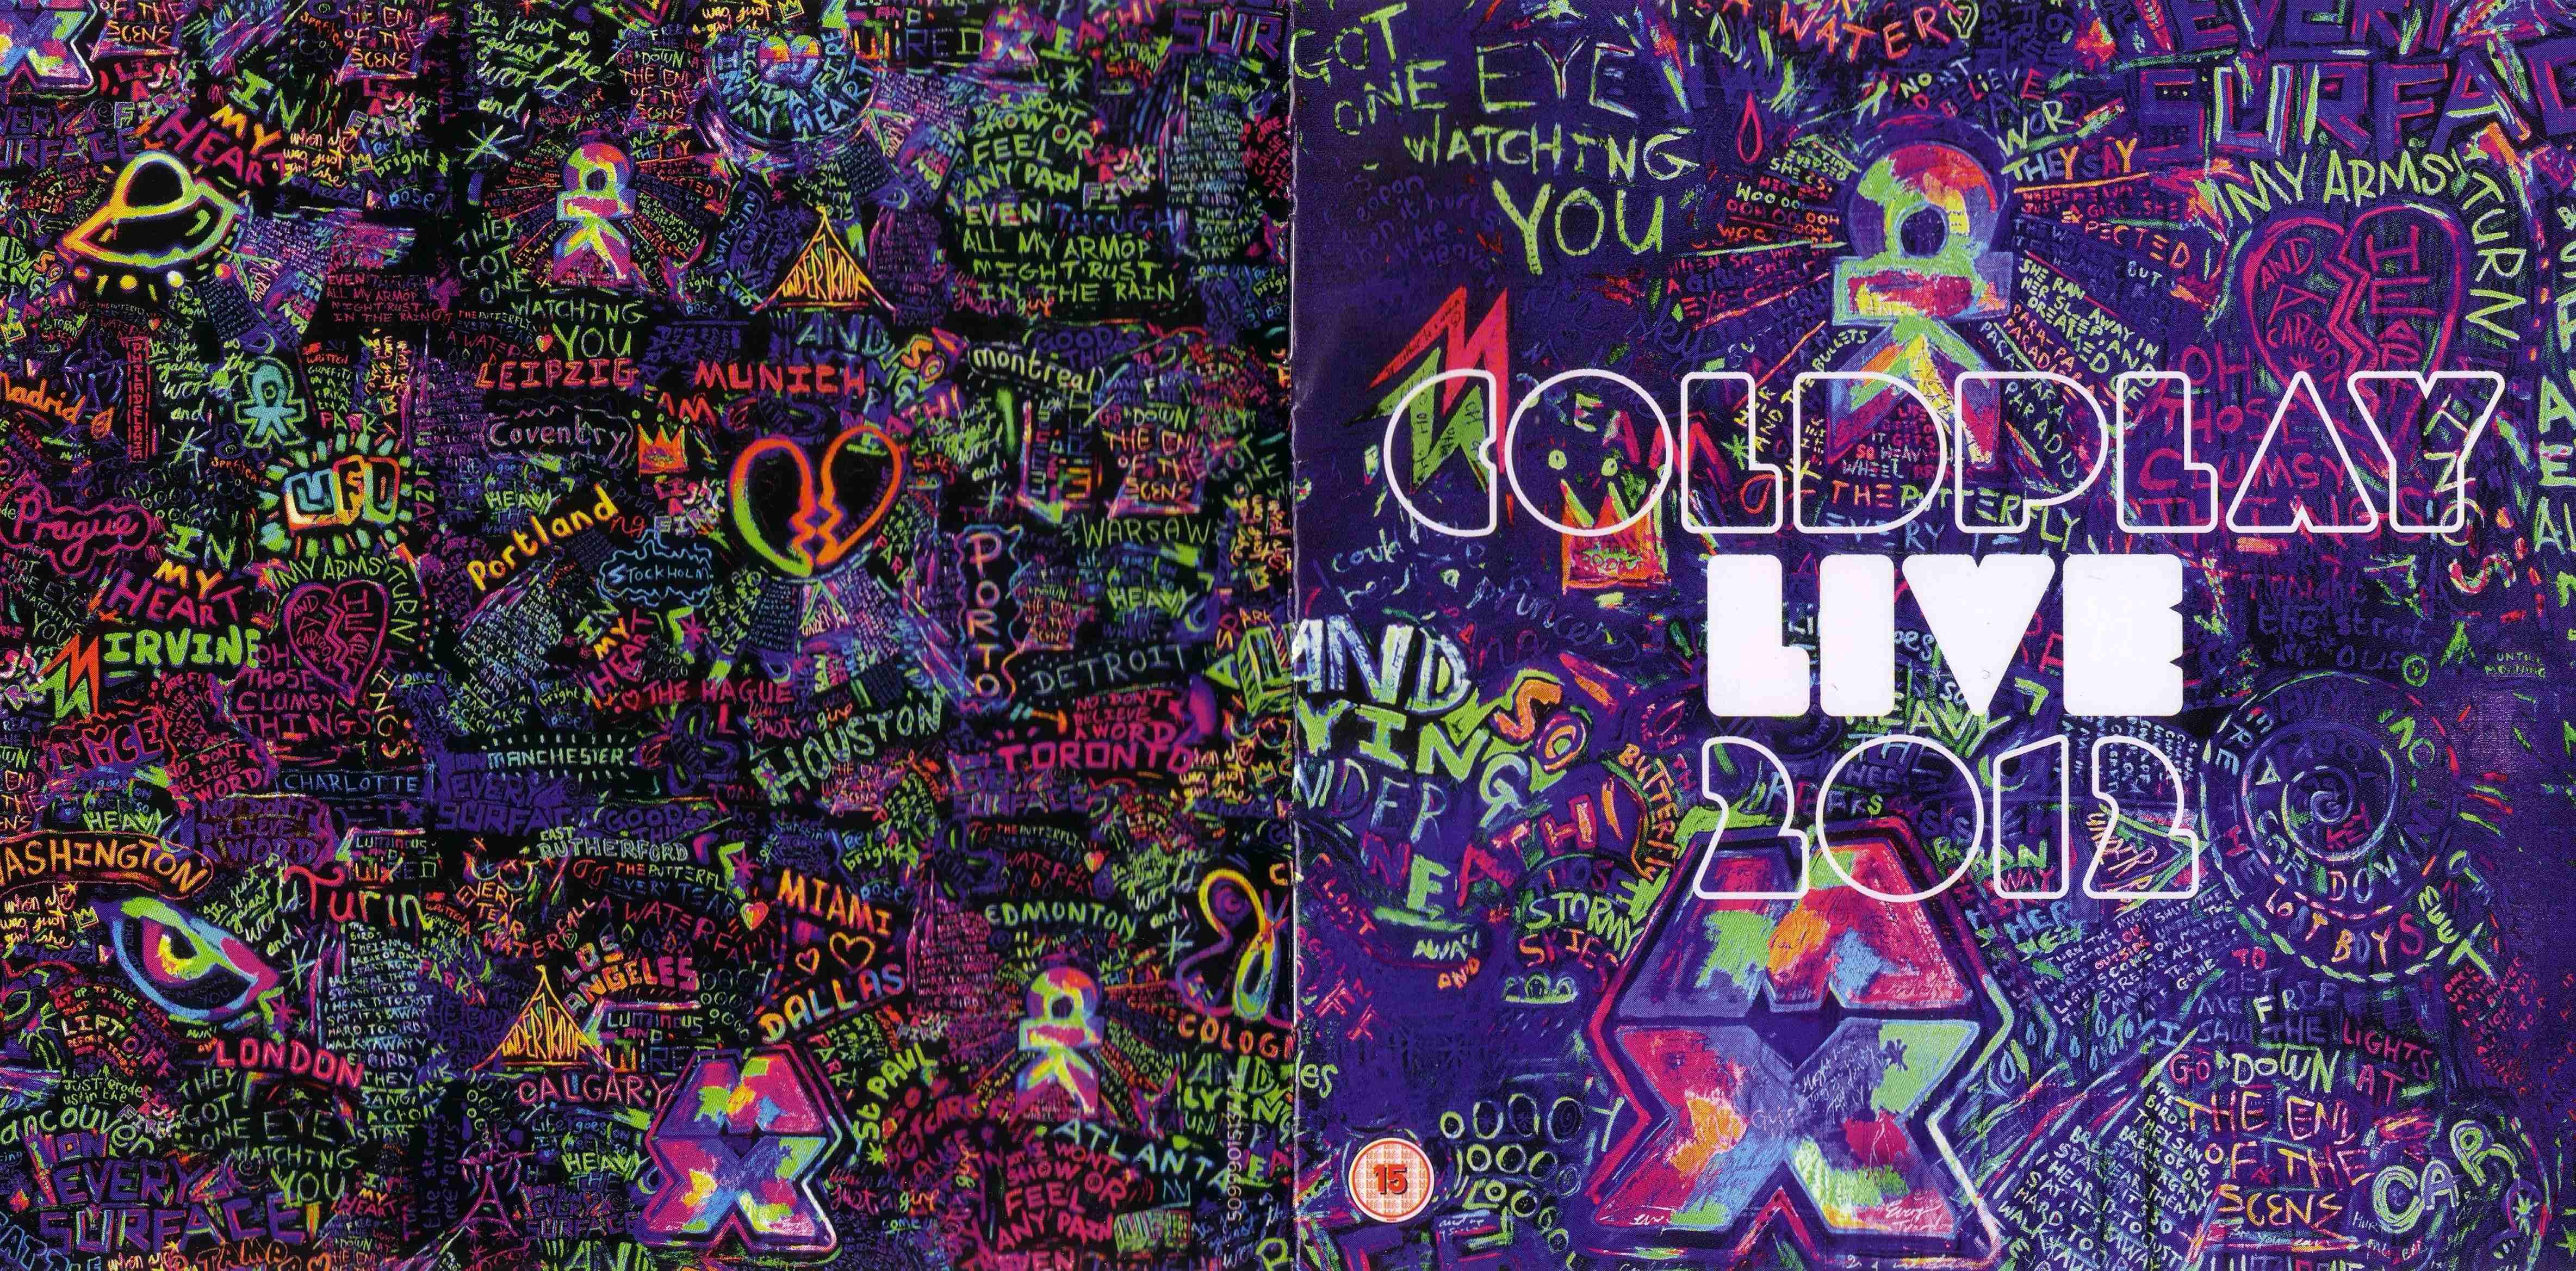 Download Coldplay - Live 2012 (2012)  mp3 -320 Kbps